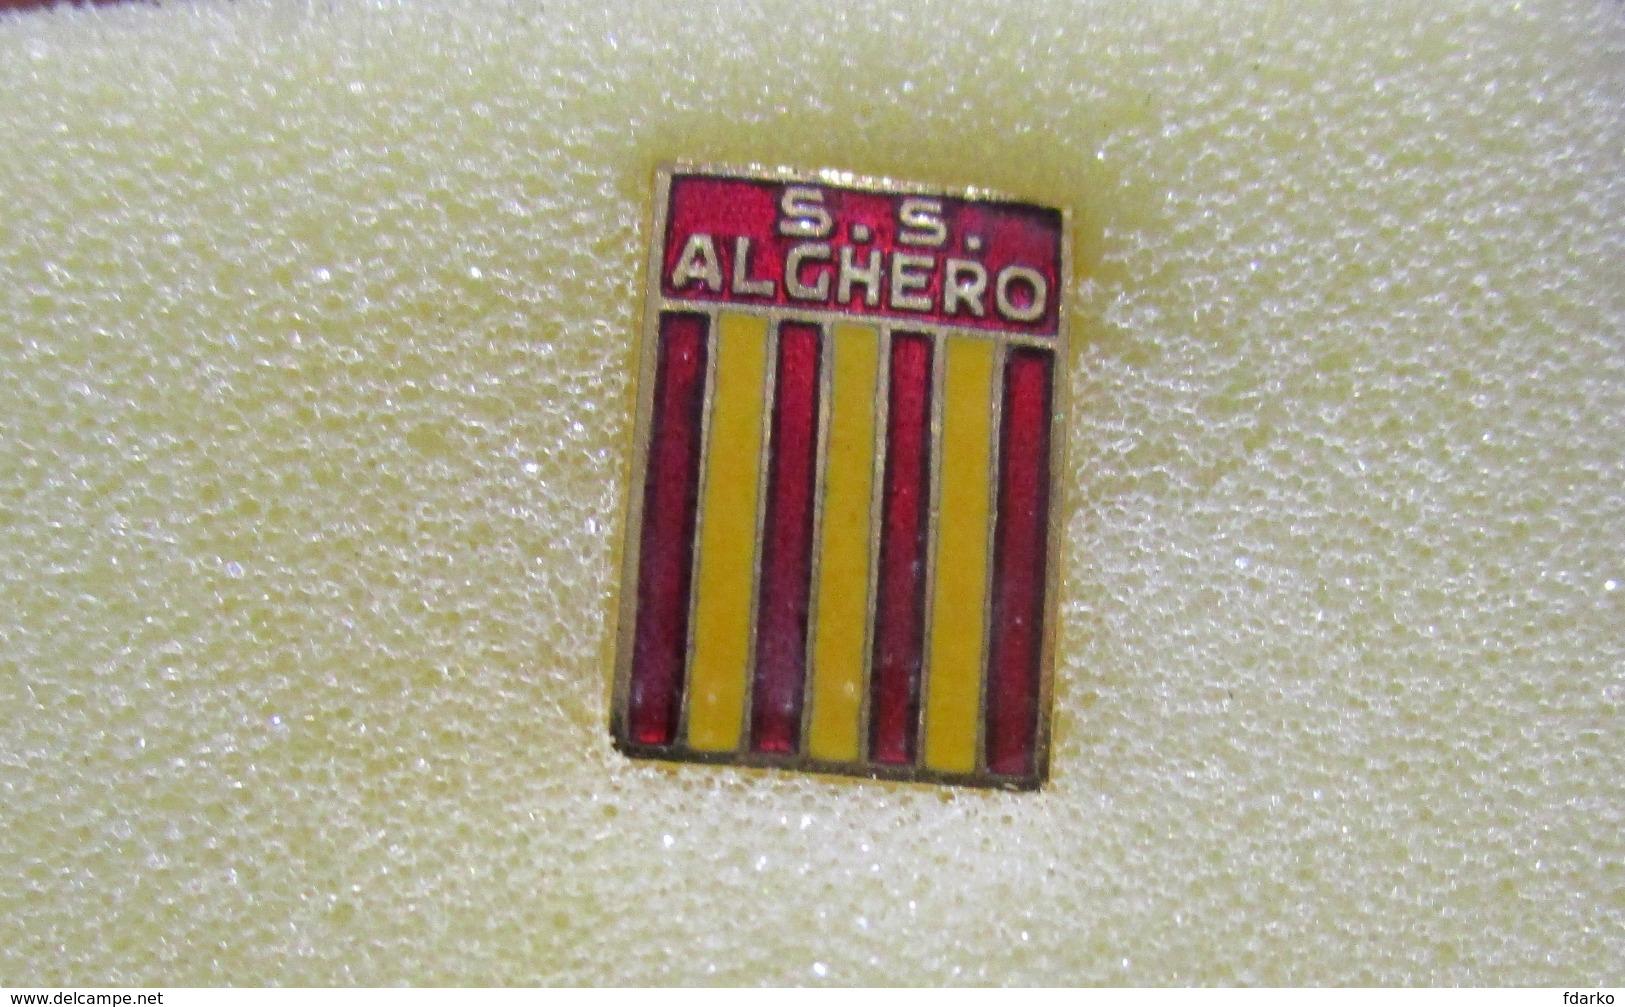 S.S. Alghero Calcio Distintivi FootBall Soccer Spilla Pins Sardegna Italy Conio Busellato Genova - Calcio